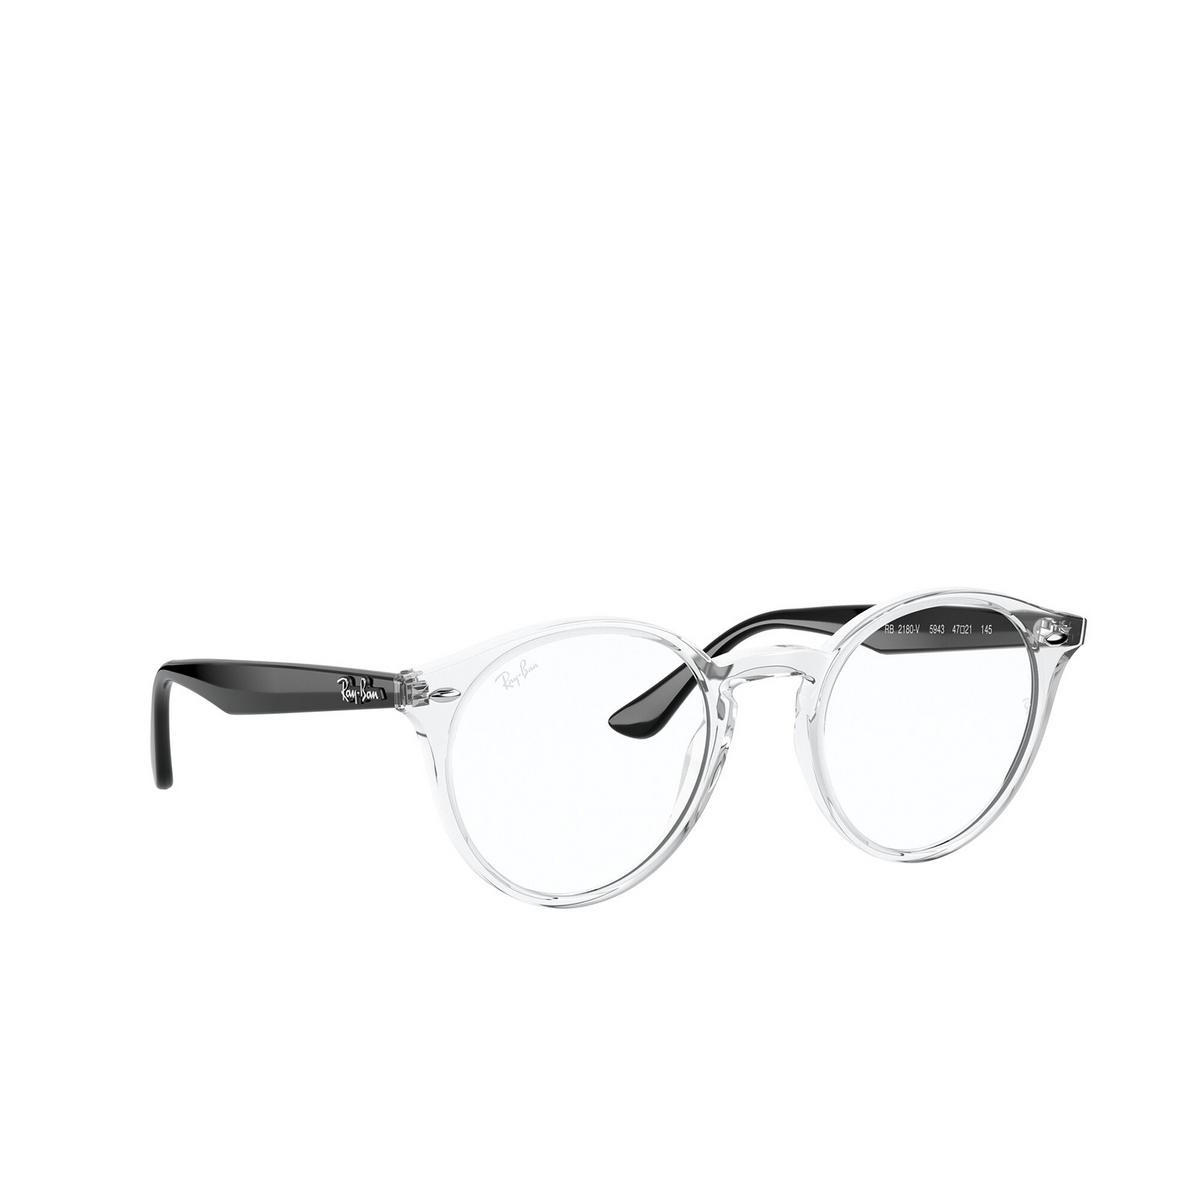 Ray-Ban® Round Eyeglasses: RX2180V color Transparent 5943 - three-quarters view.